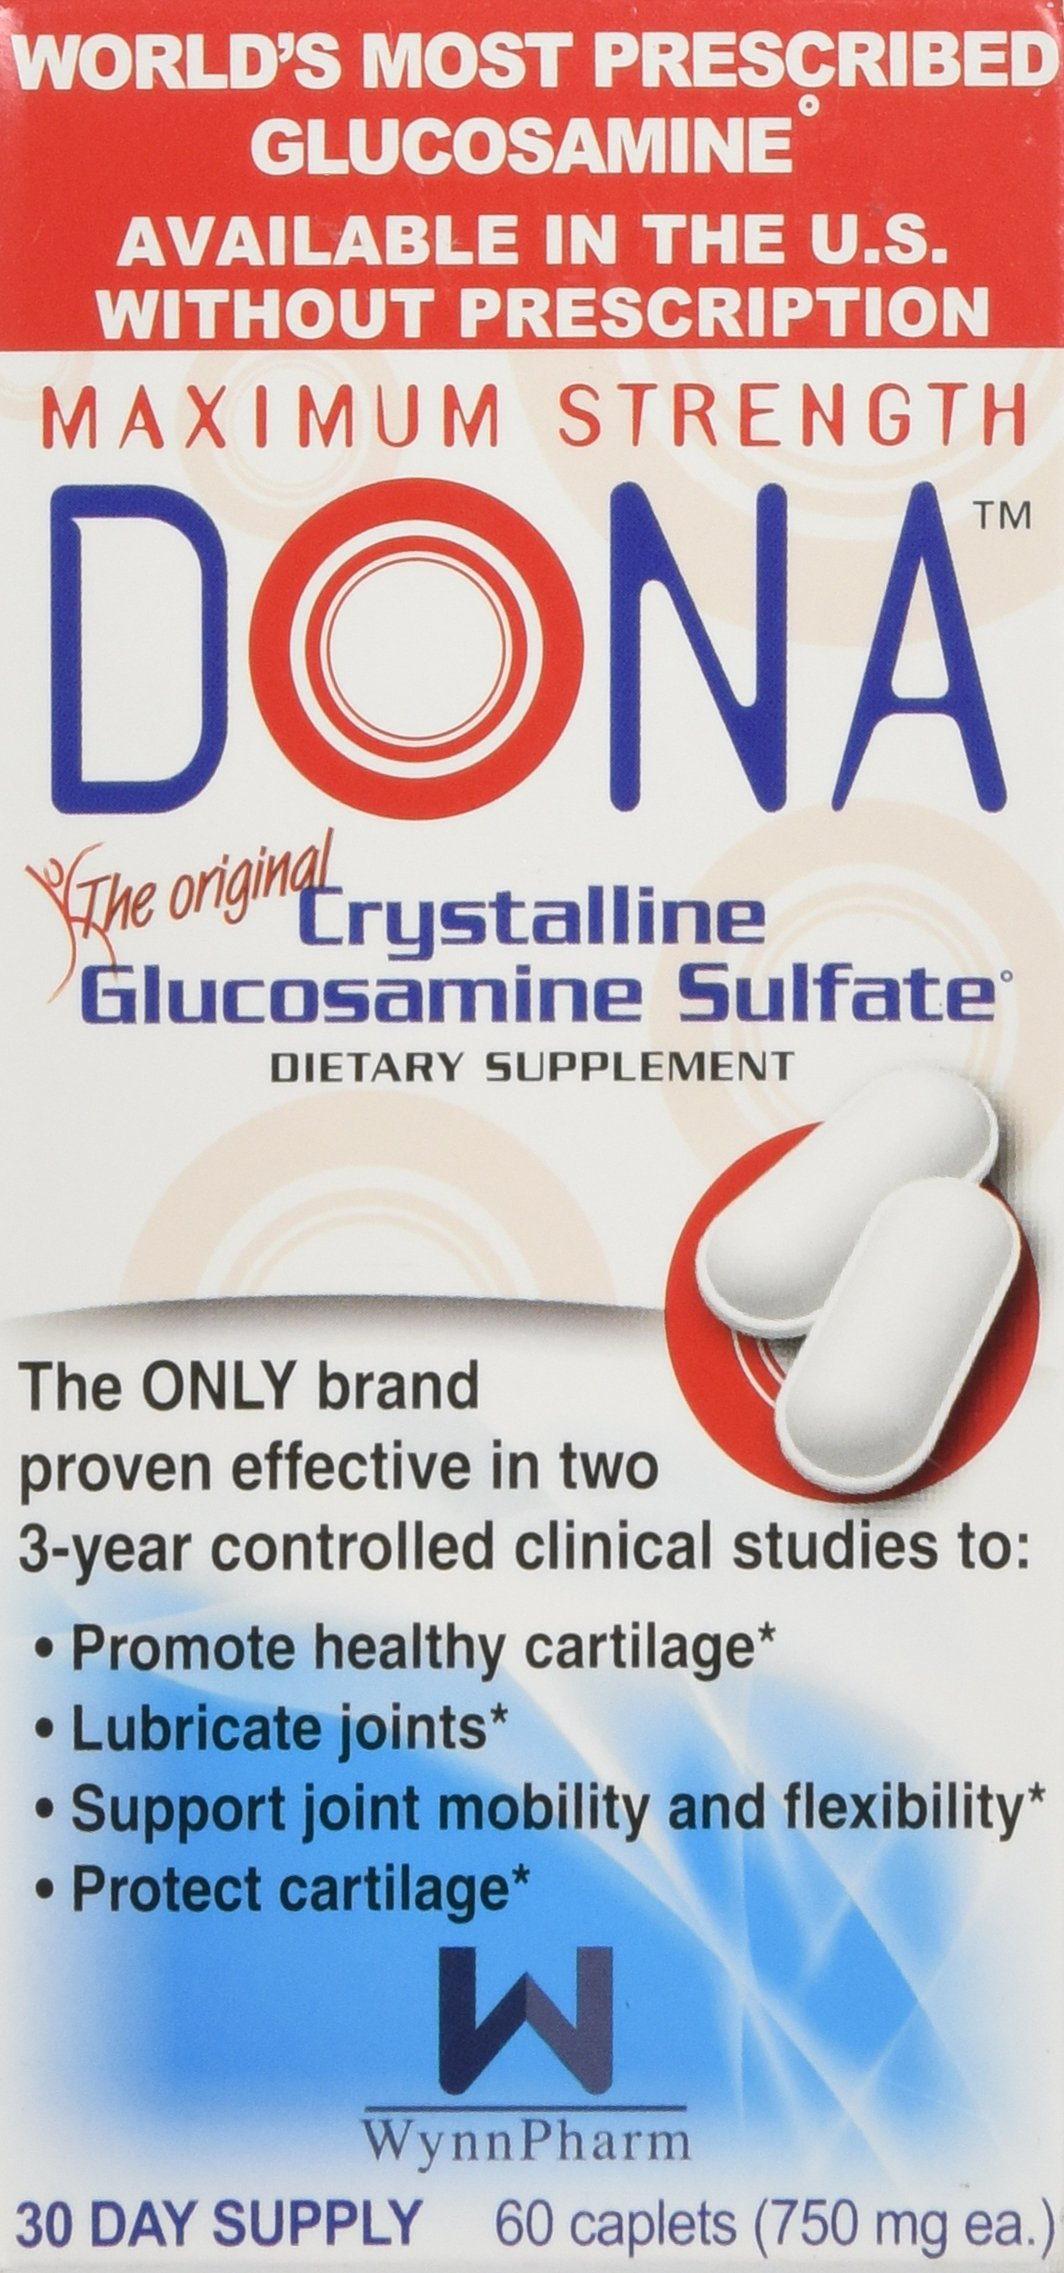 DONA Crystalline Glucosamine Sulfate 60 caplets [Health and Beauty] by WynnPharm, Inc.